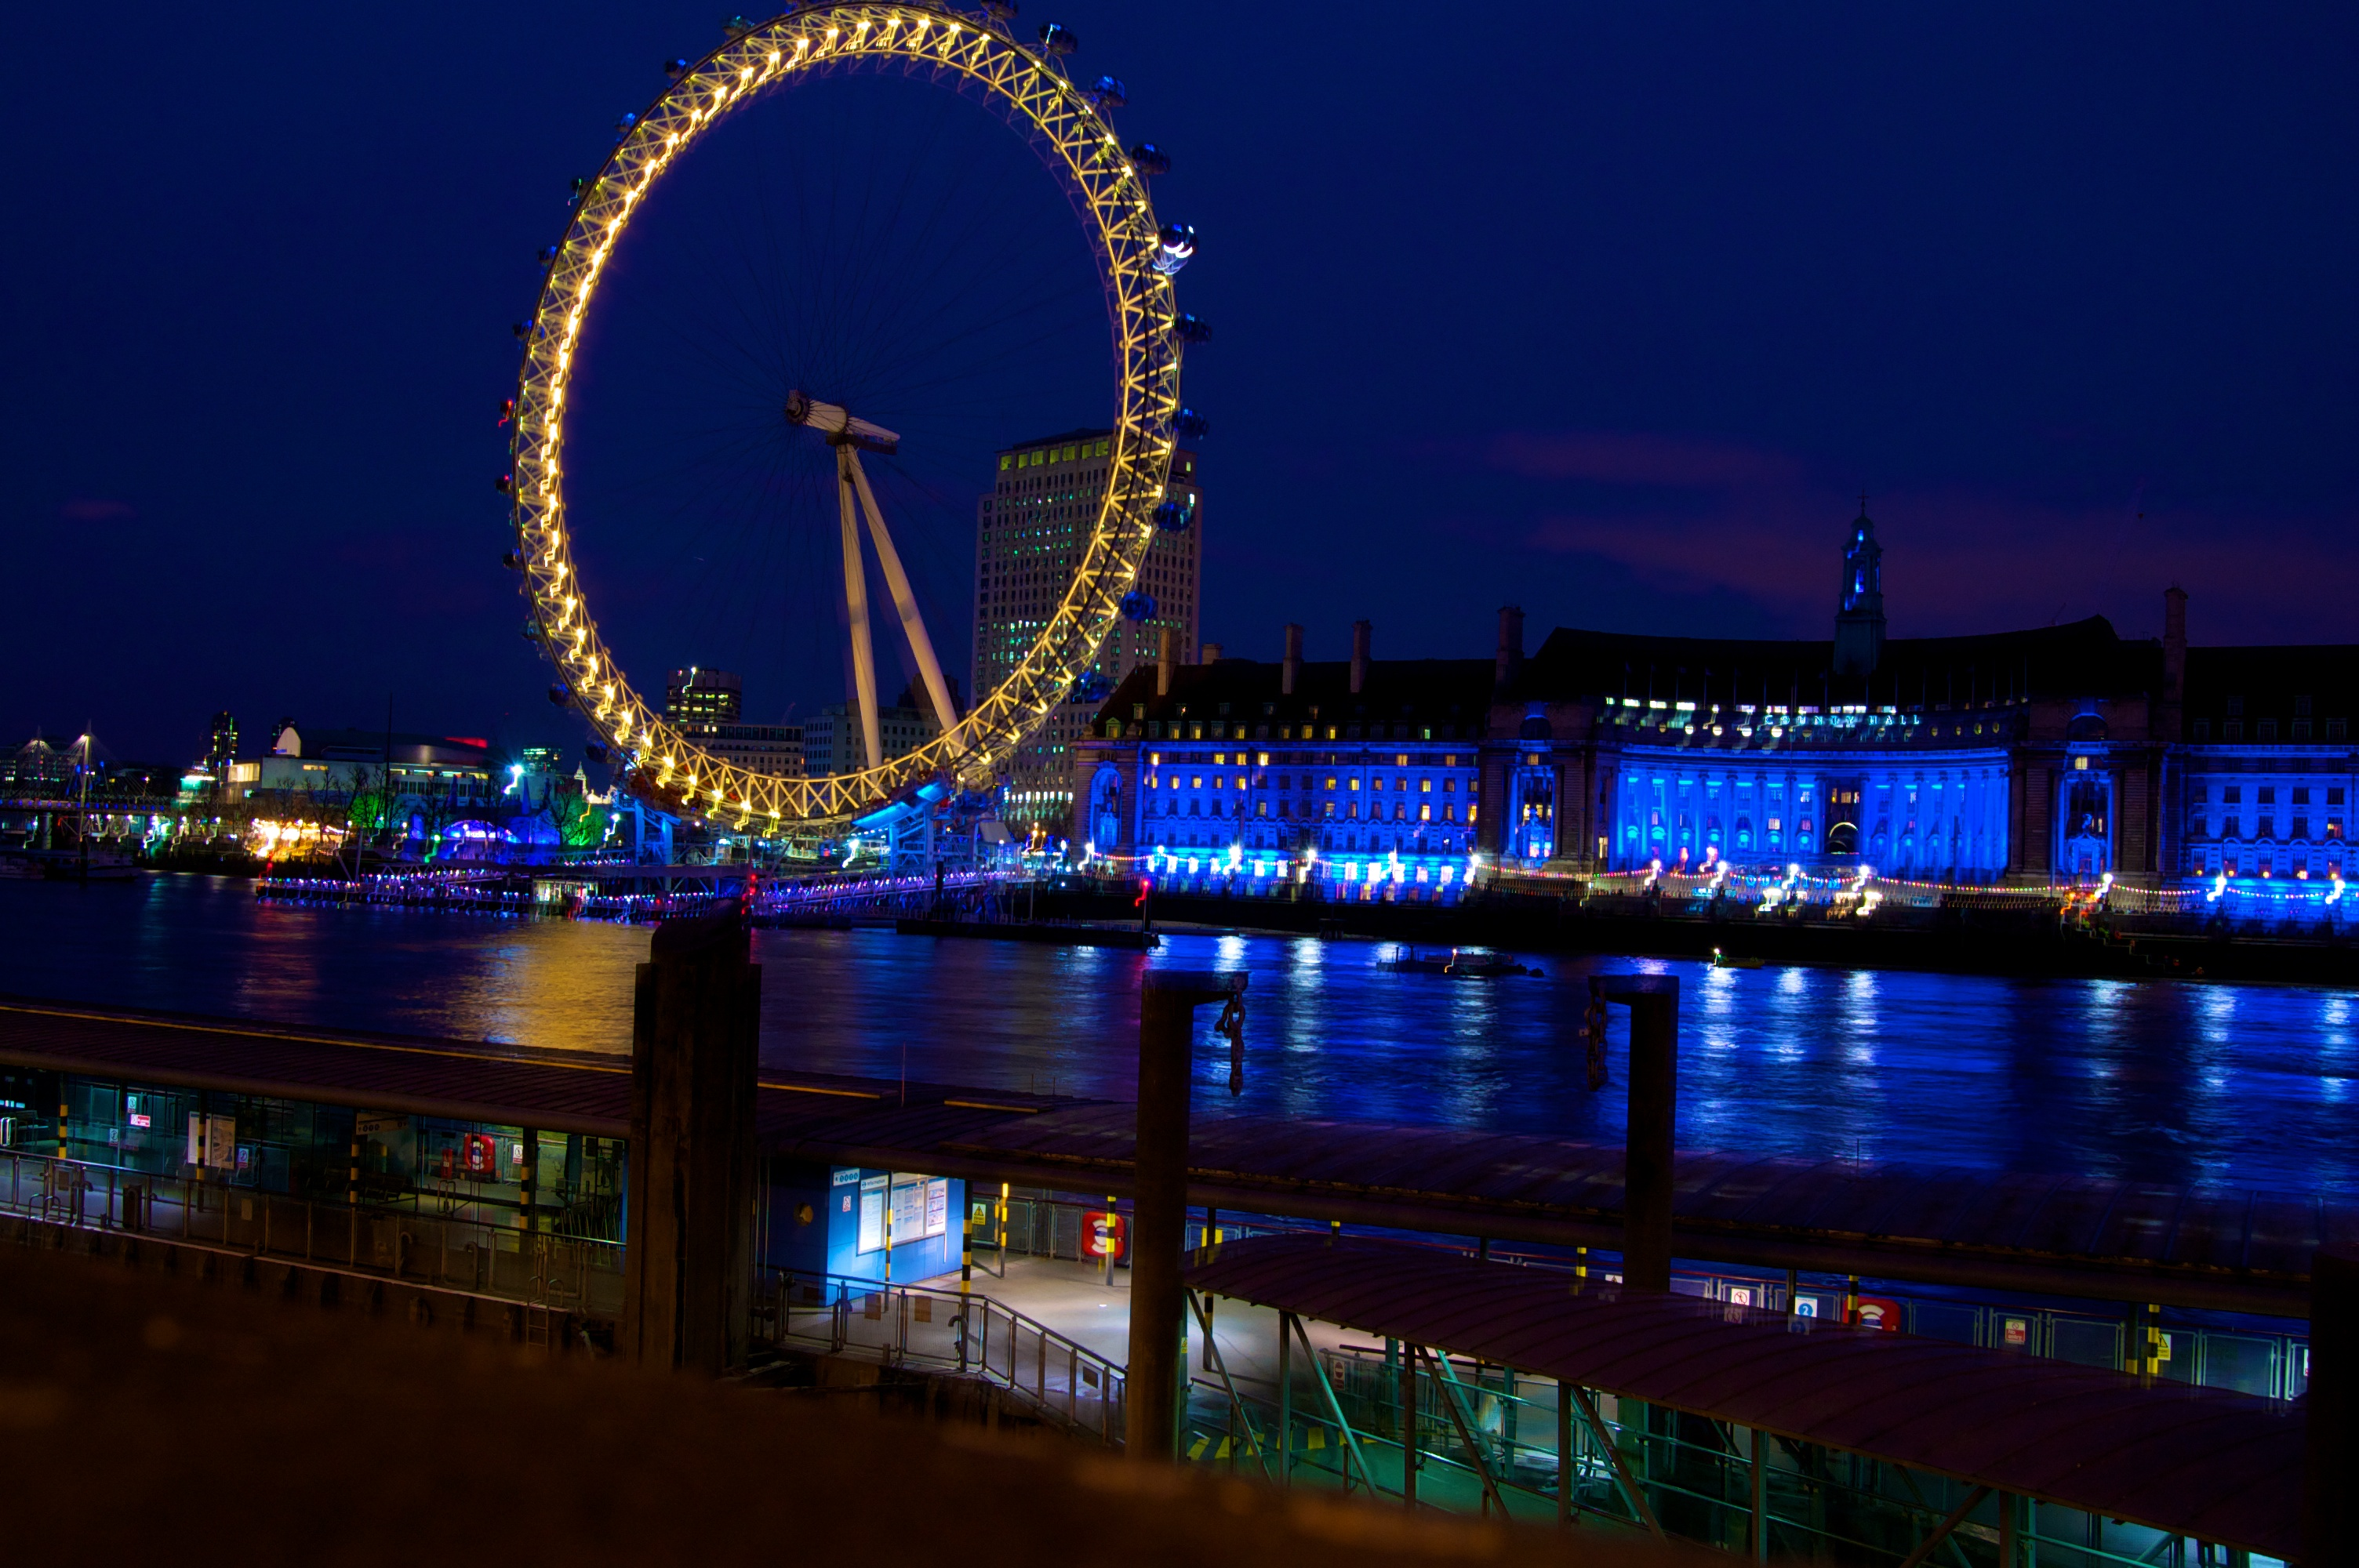 The London Eye, at night.